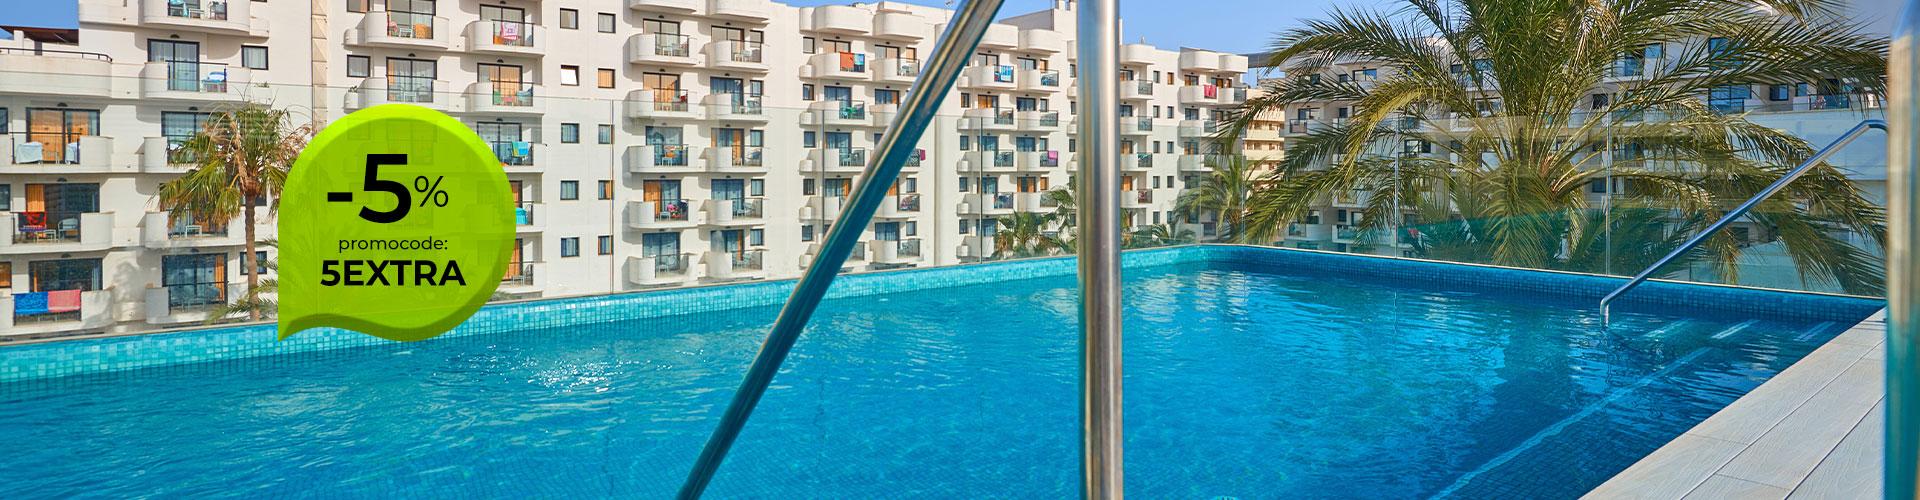 http://protur-hotels.com/files/_protur-palmeras-playa-hotel-sa-coma-mallorca.jpg